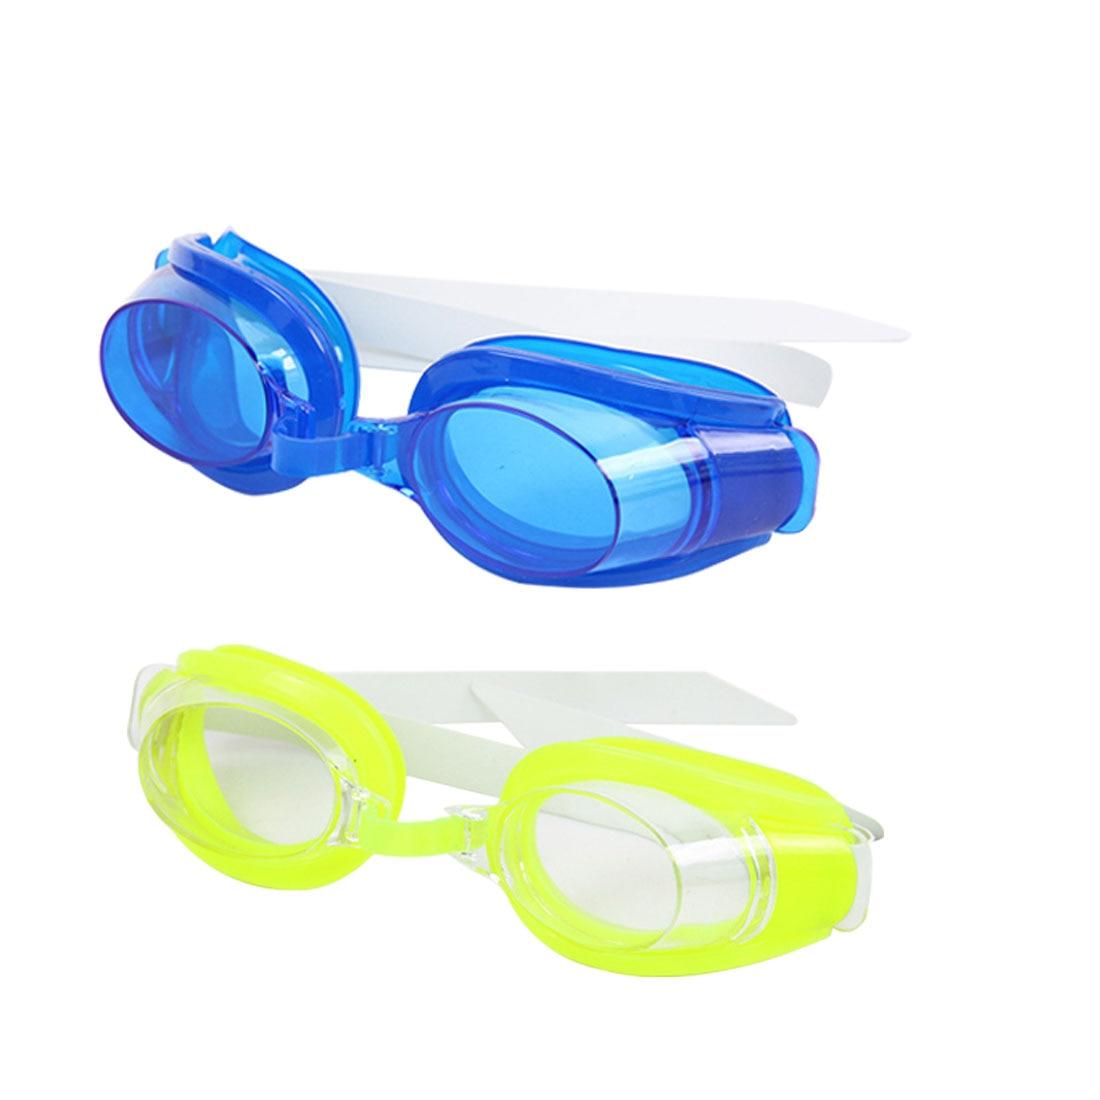 Kids Children Waterproof Anti fog Swimming brille Outdoor Sports Swimming Pool Eyewear & Ear Plugs Nose Clip